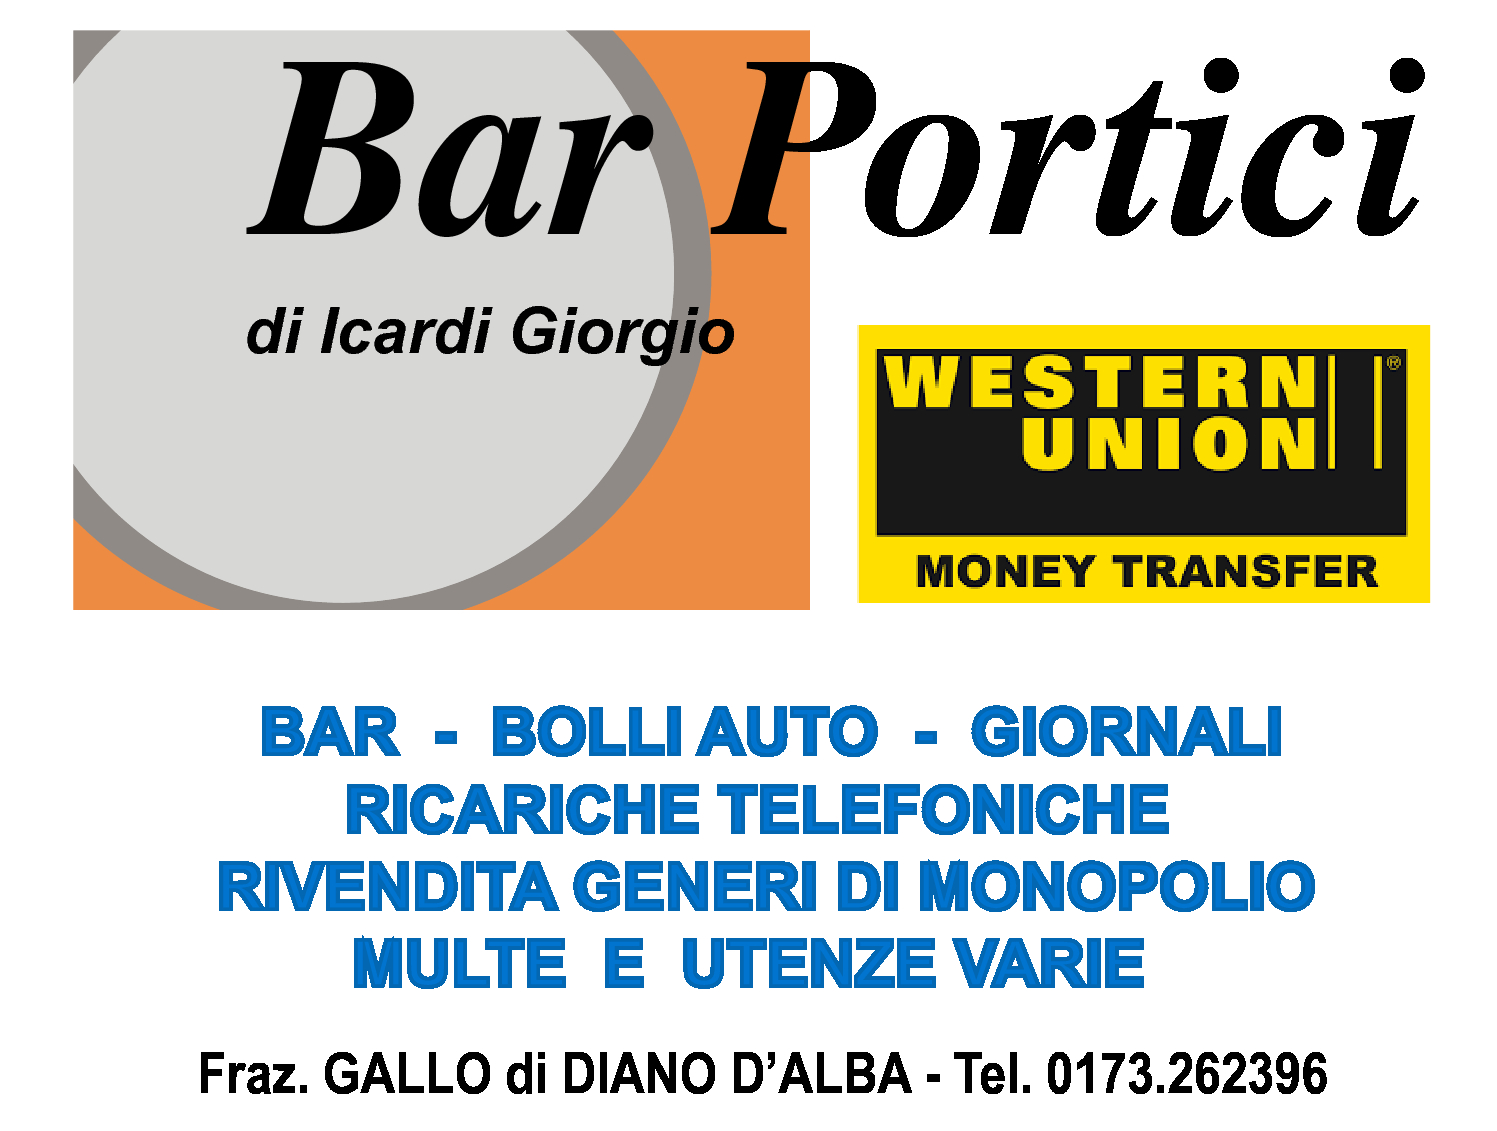 Bar Portici